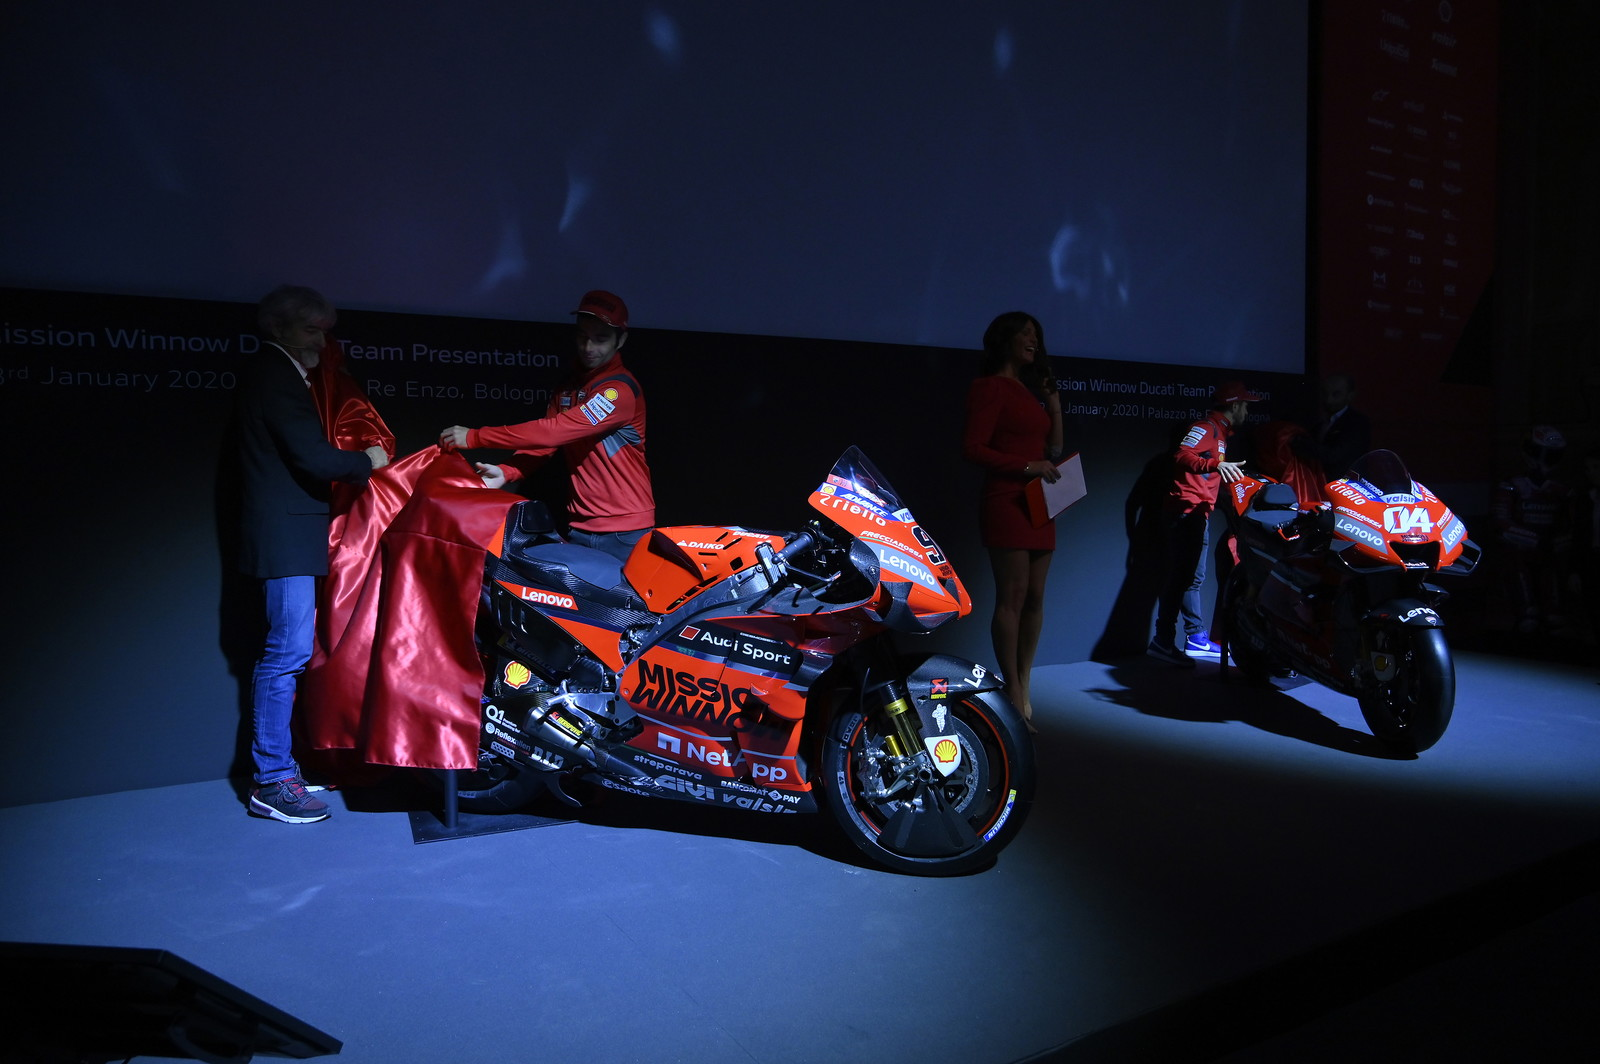 La nuova Desmosediciè la prima MotoGP del 2020 a mostrarsi.